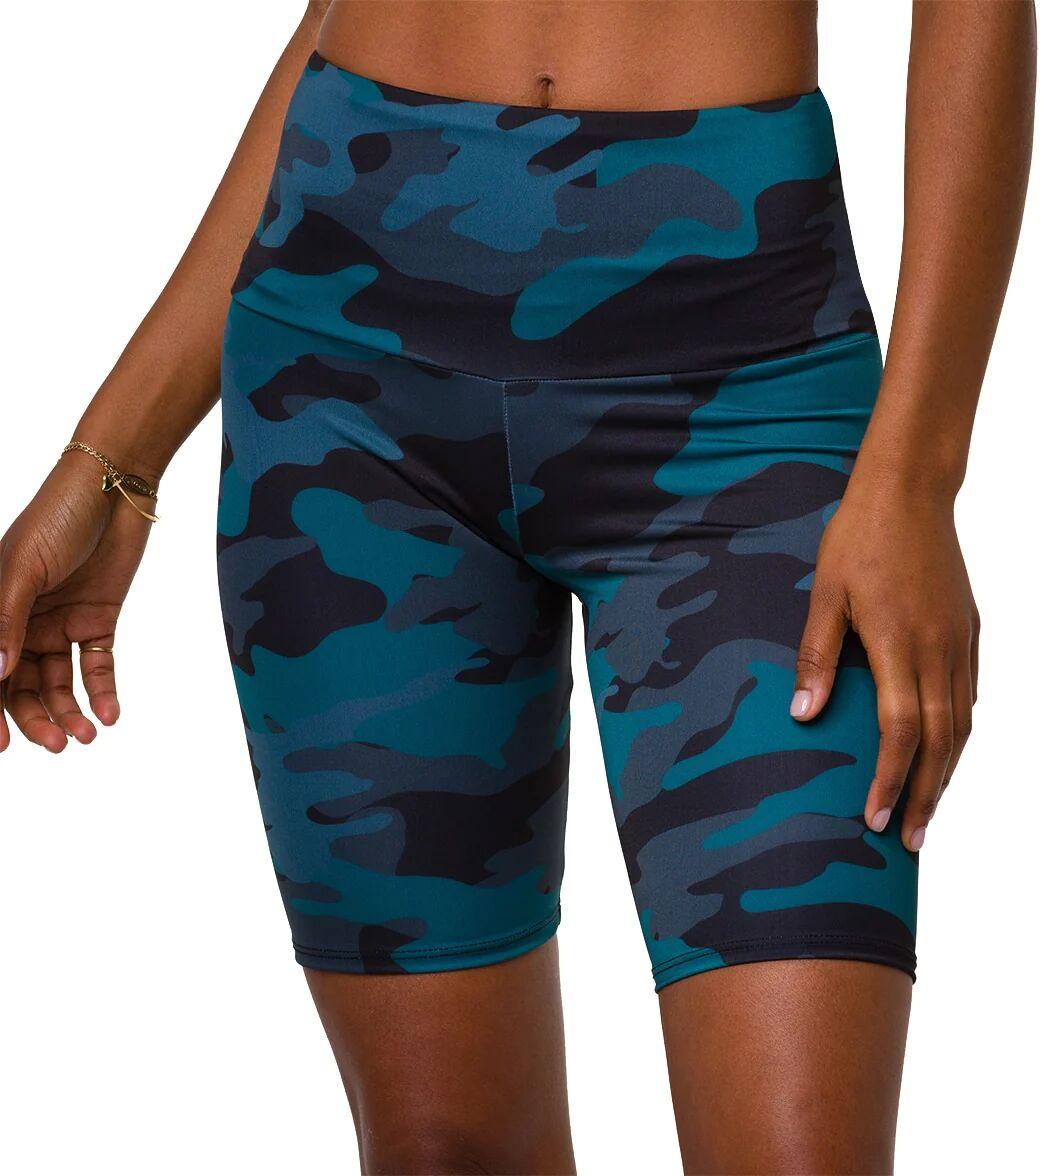 Onzie Women's High Rise Bike Shorts - Disguised - ML Spandex